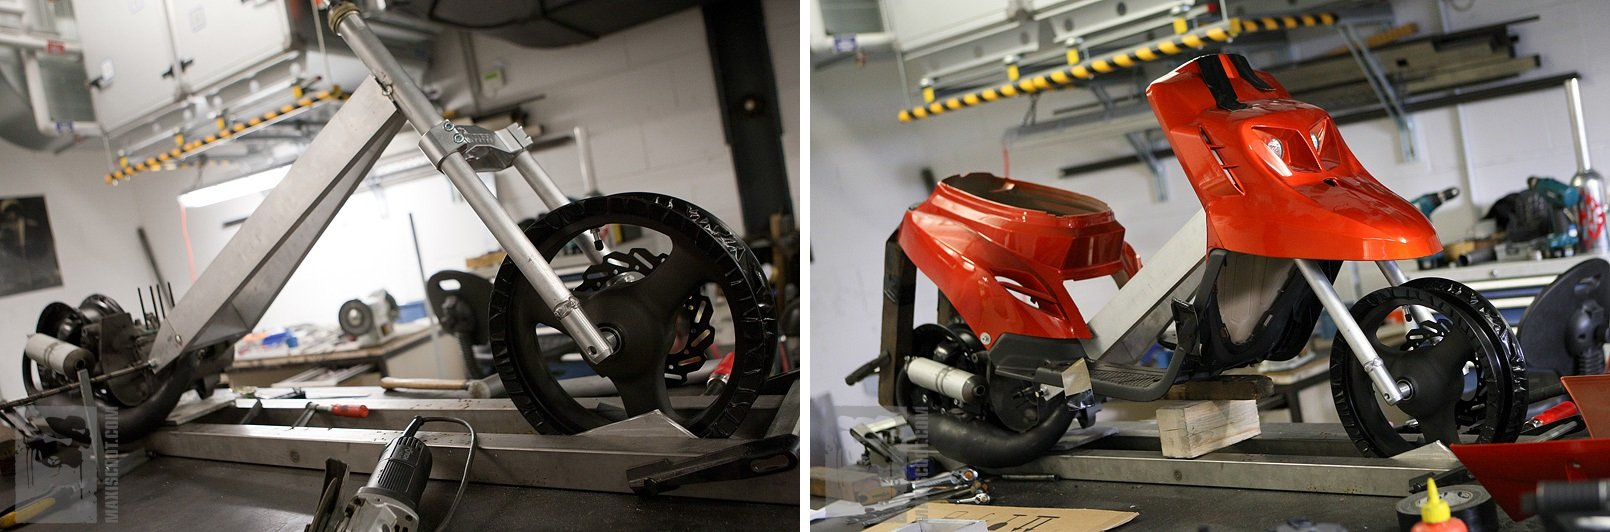 frame-aluminium-mbk-booster-mxs-racing